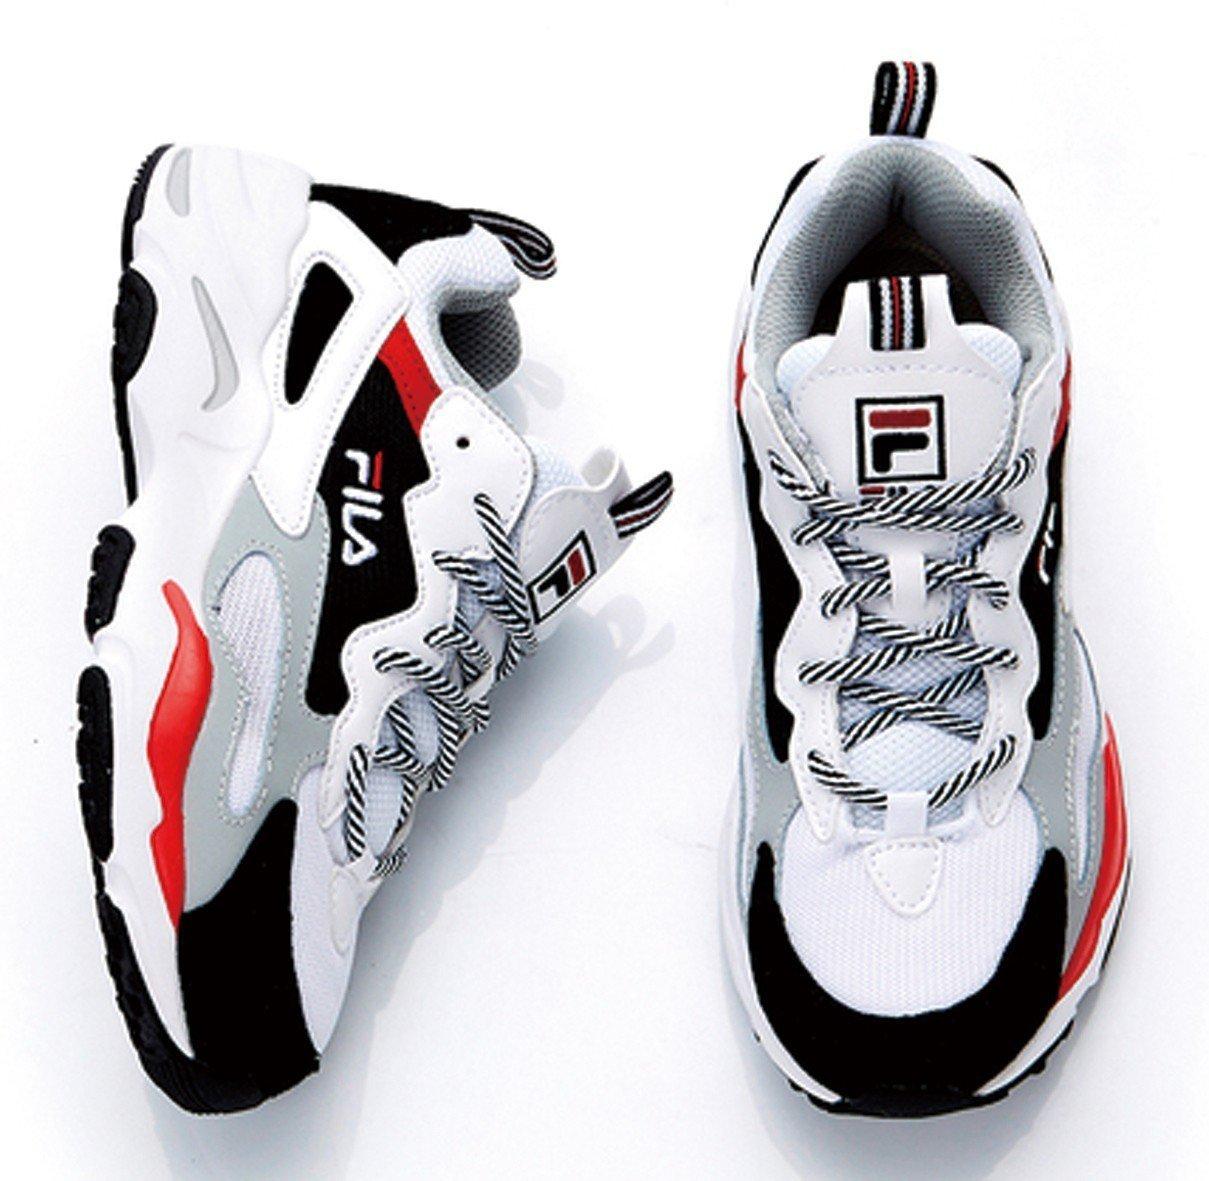 FILA限量復古老爹鞋2,480元。圖/新光三越提供